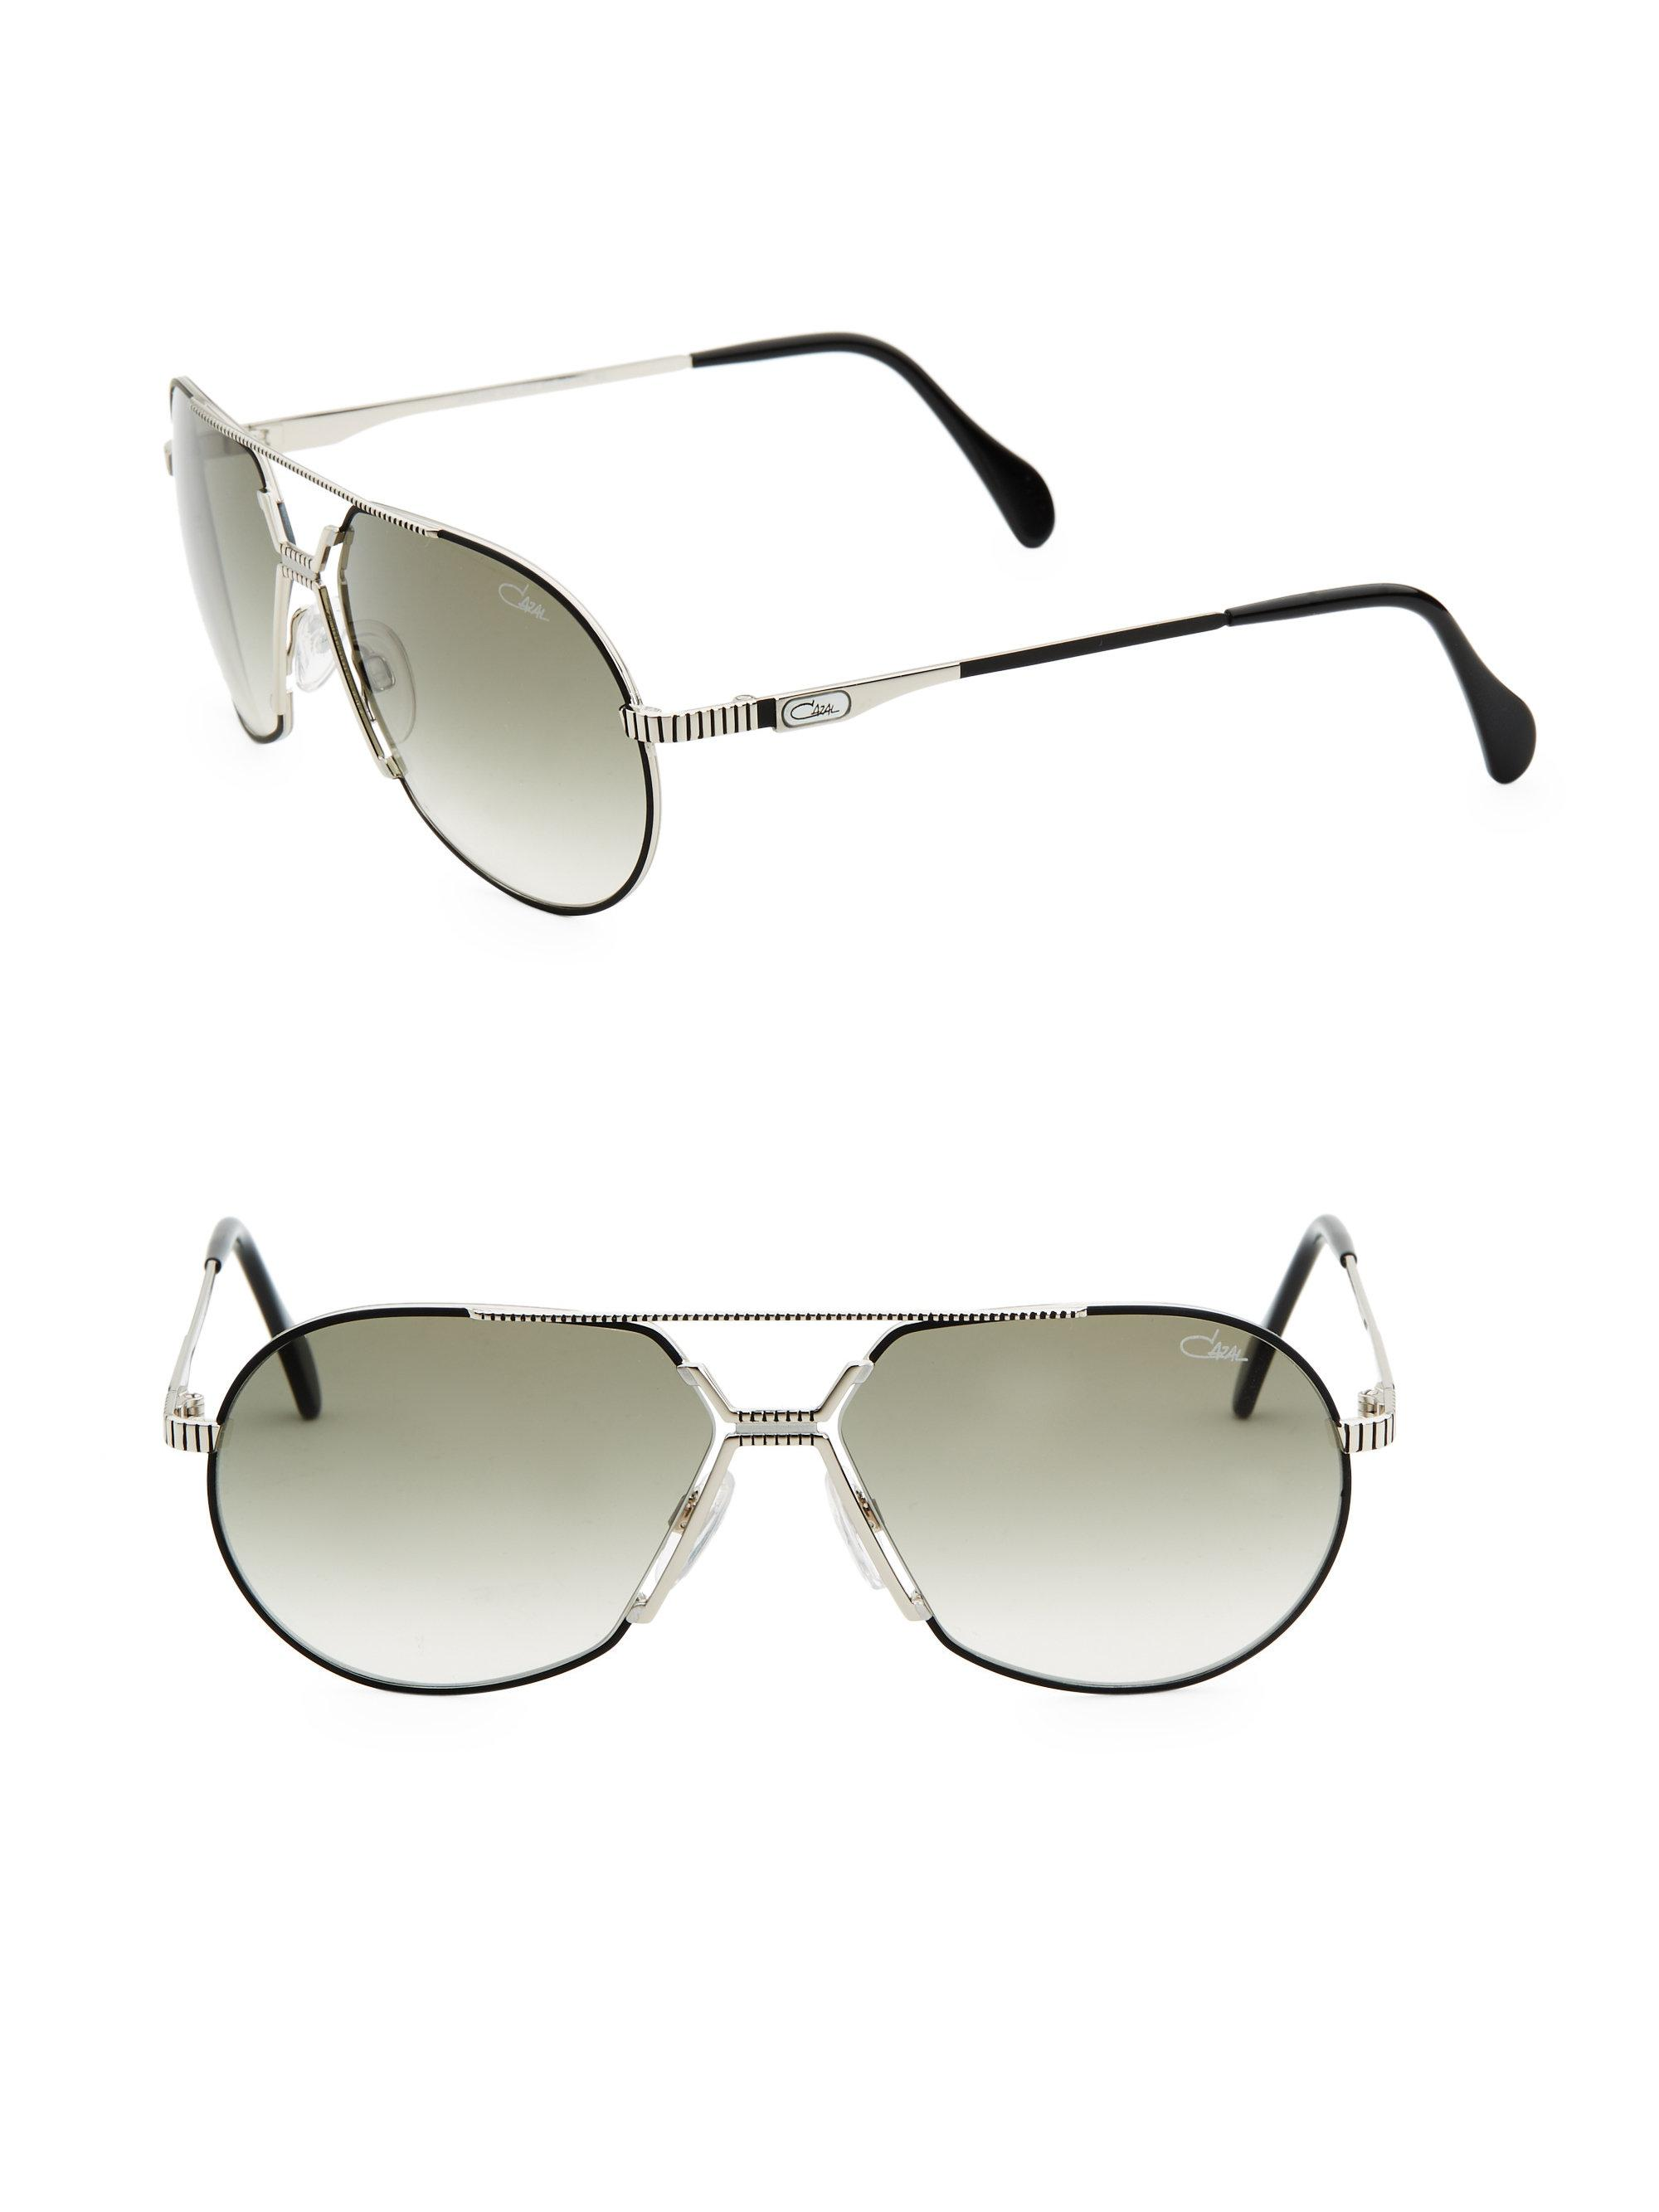 38eb2bfa71a Cazal 62mm Aviator Sunglasses - Lyst